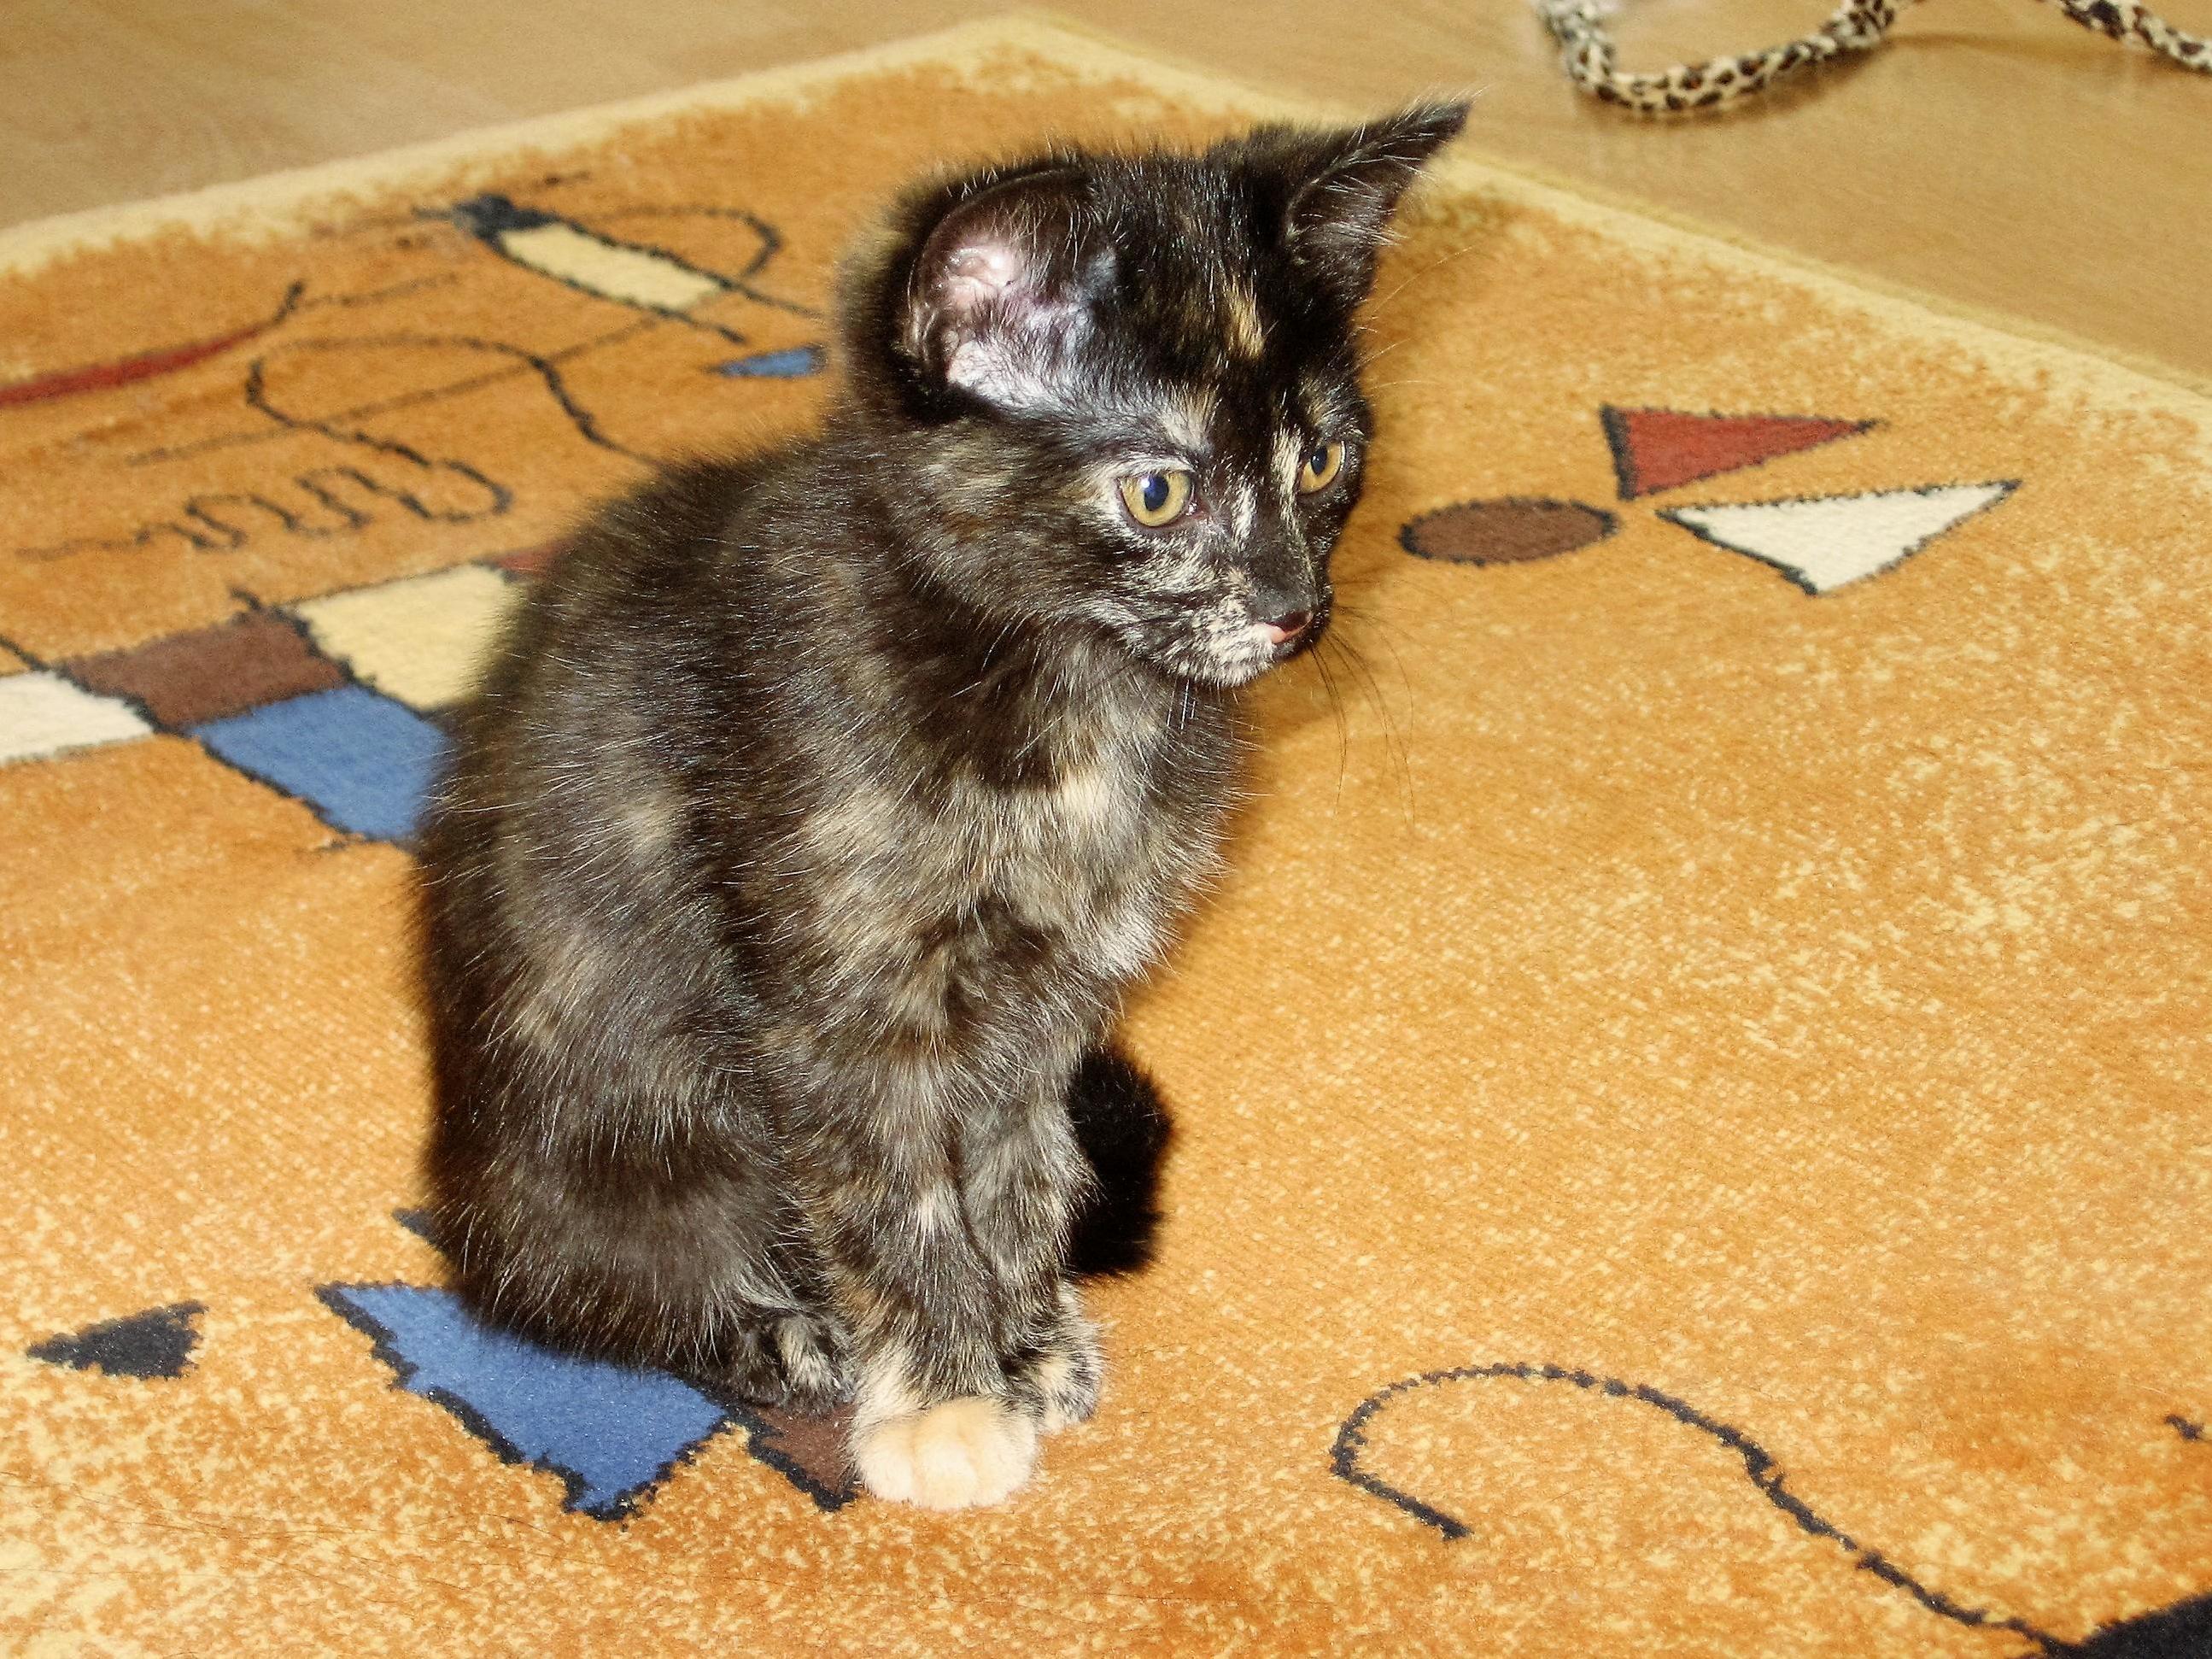 Arya was quite the sweet kitten